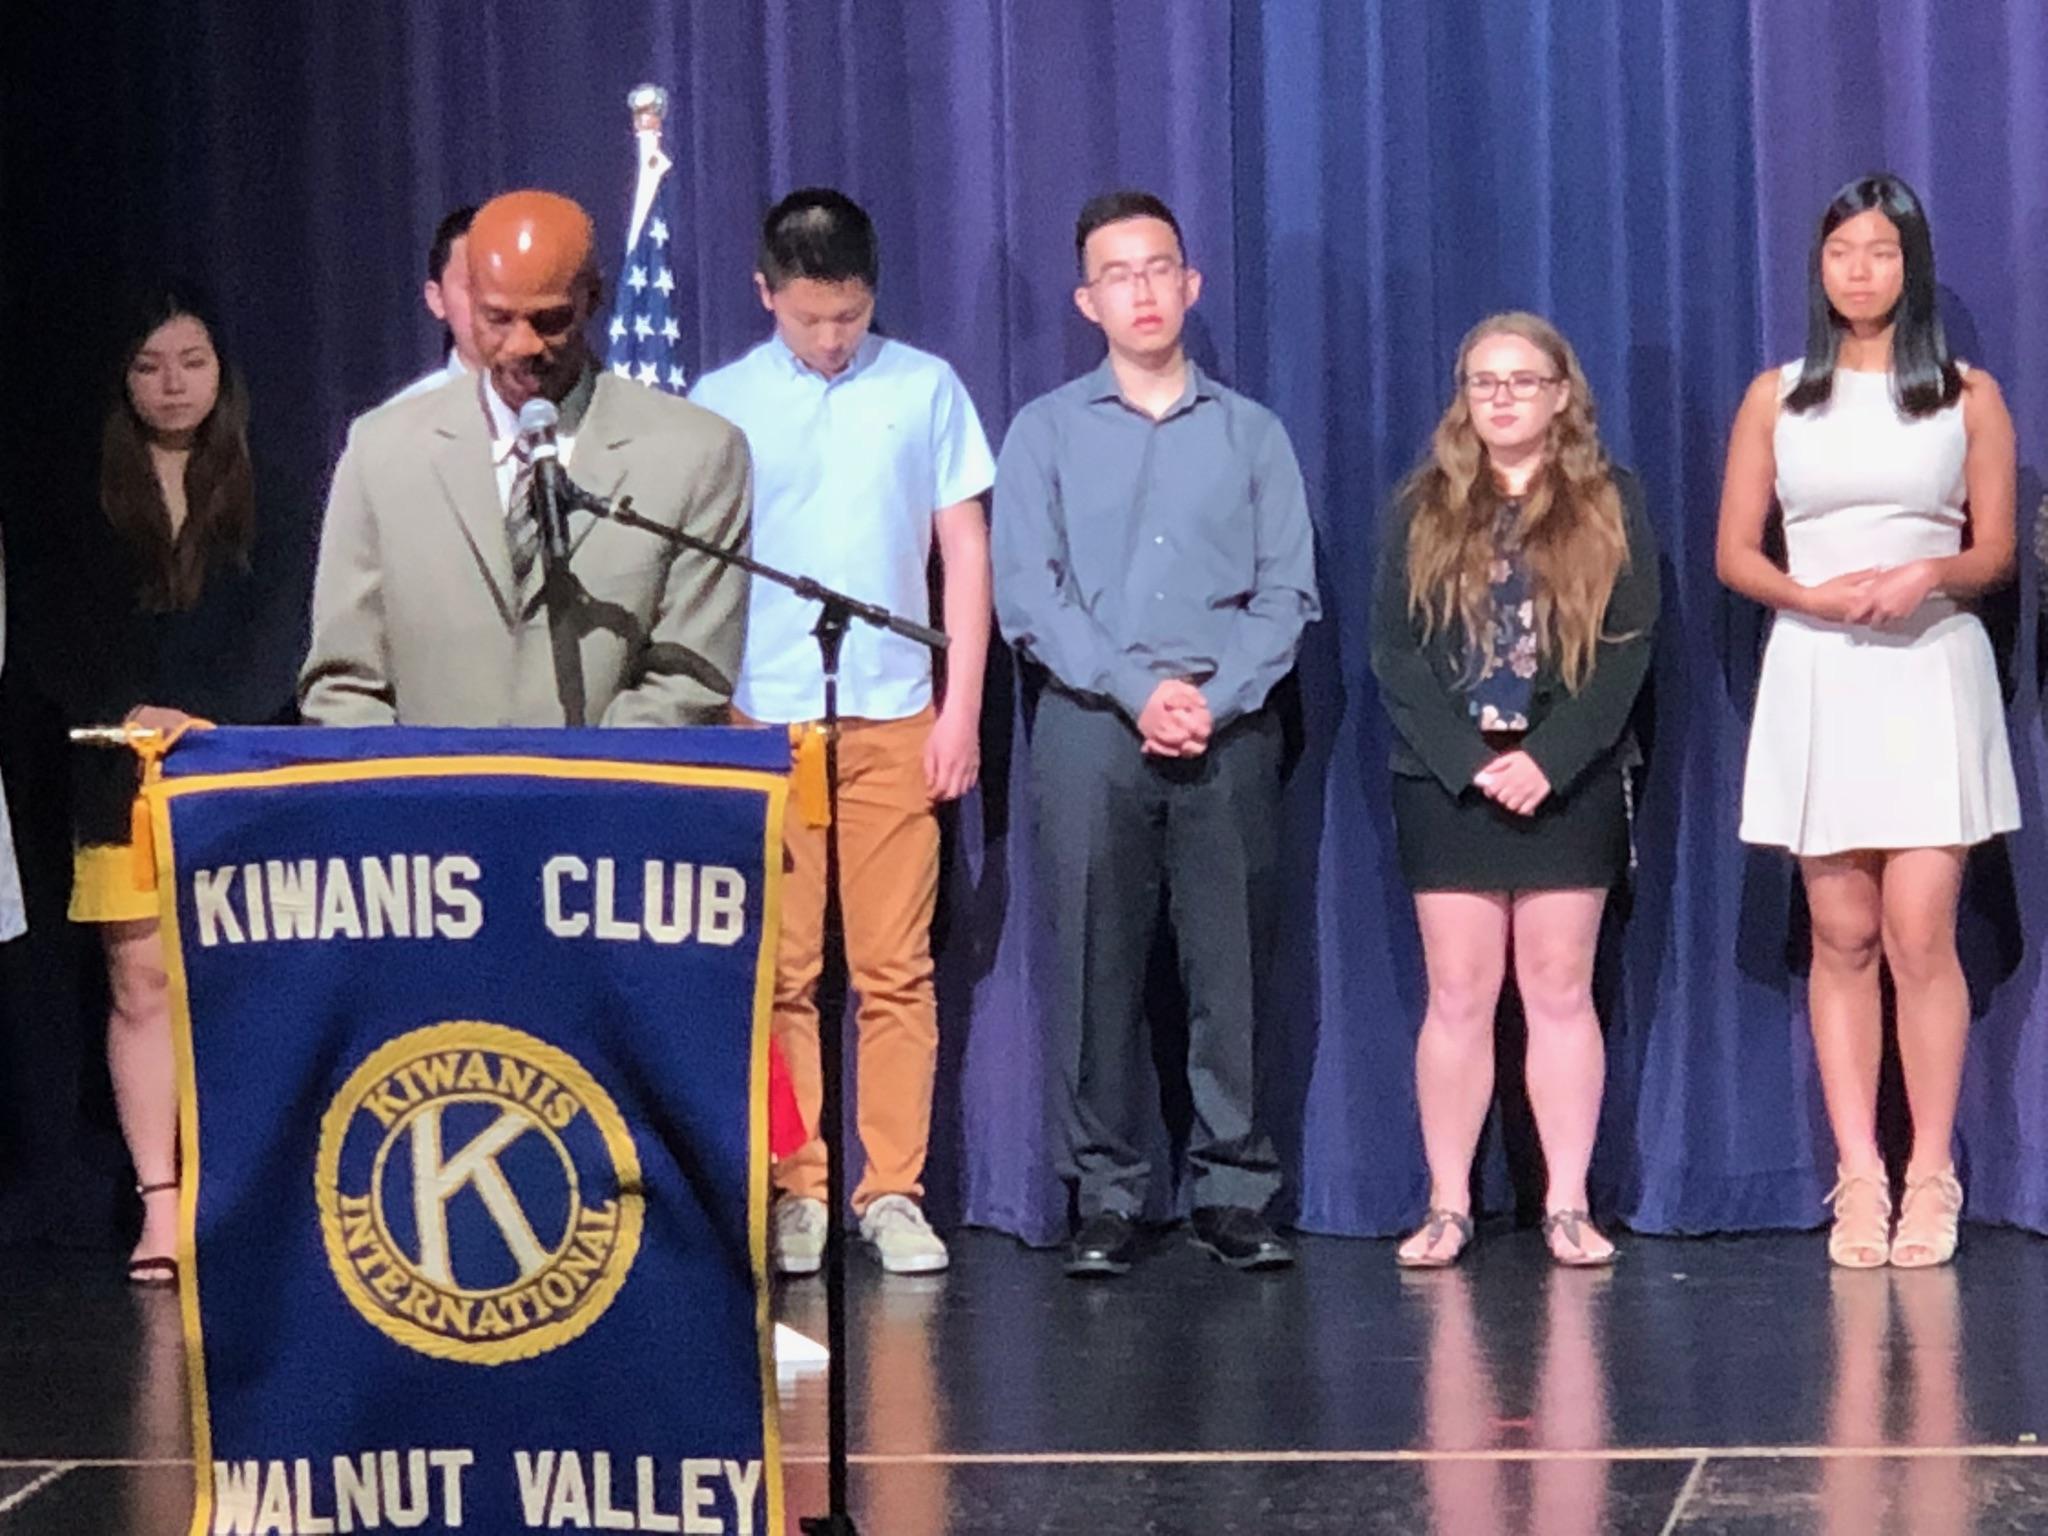 Allison Greene accepting Kiwanis Club Award